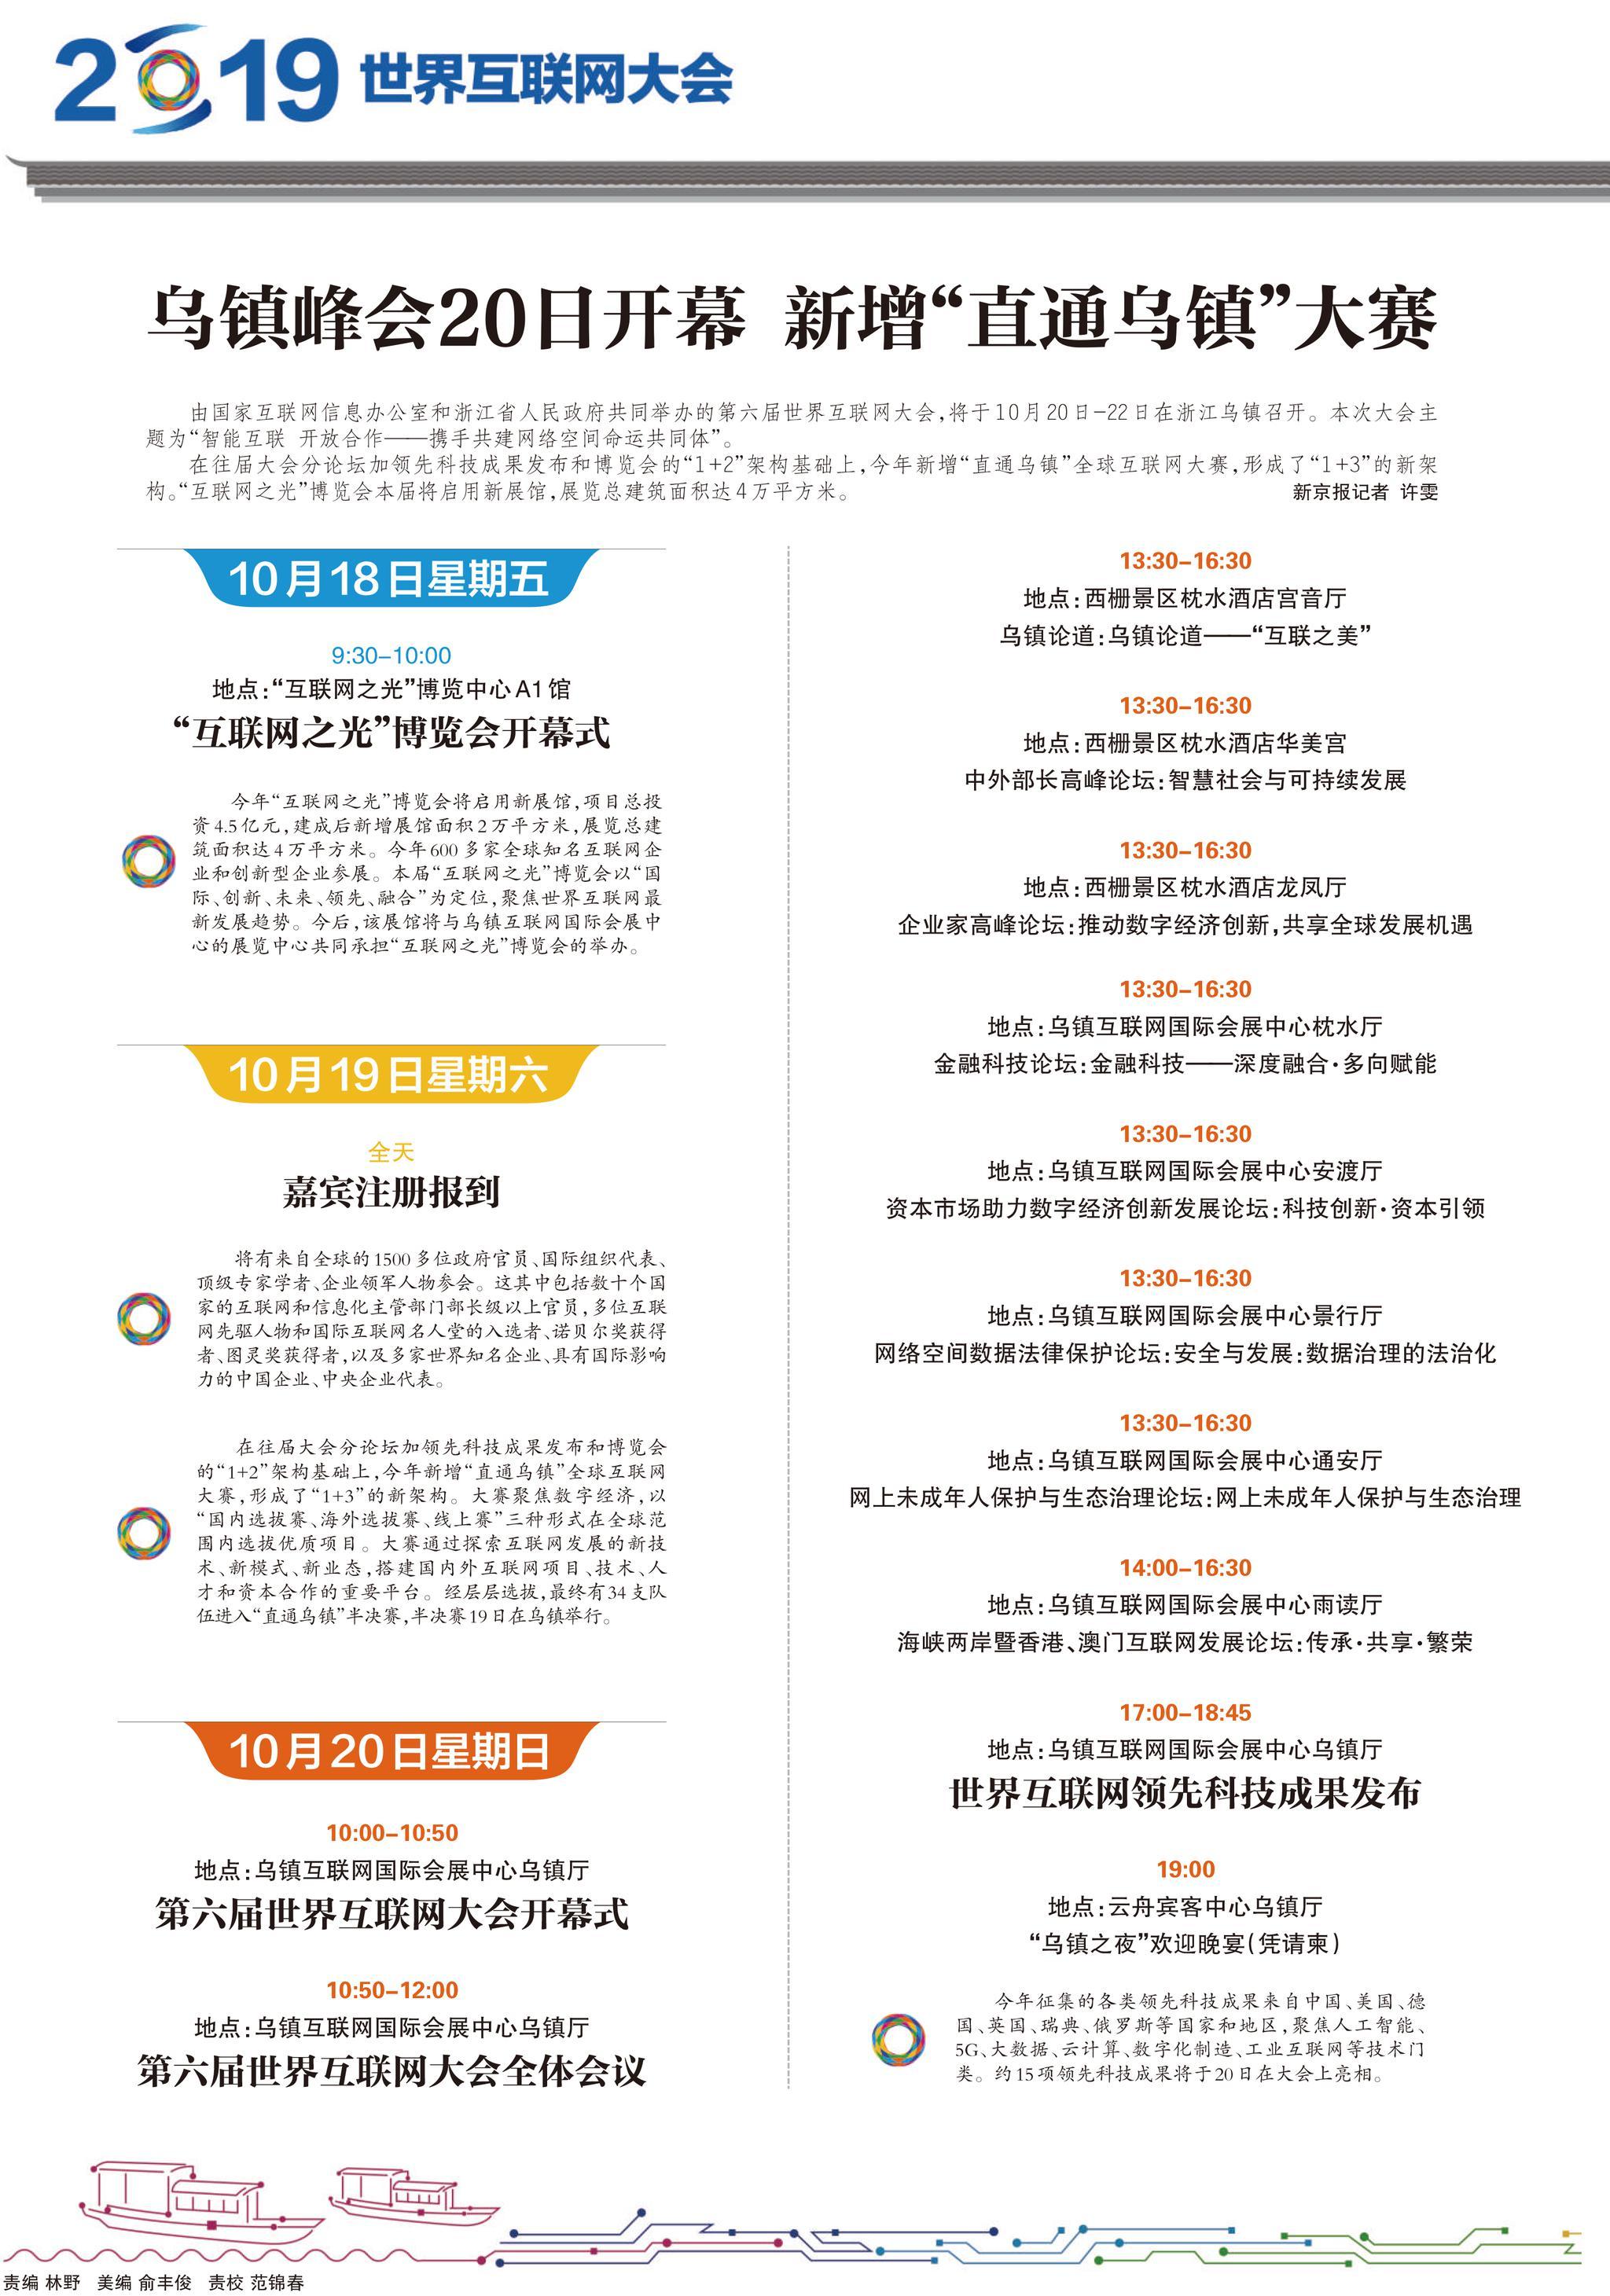 http://www.jywjkt.com/shehuiwanxiang/284979.html